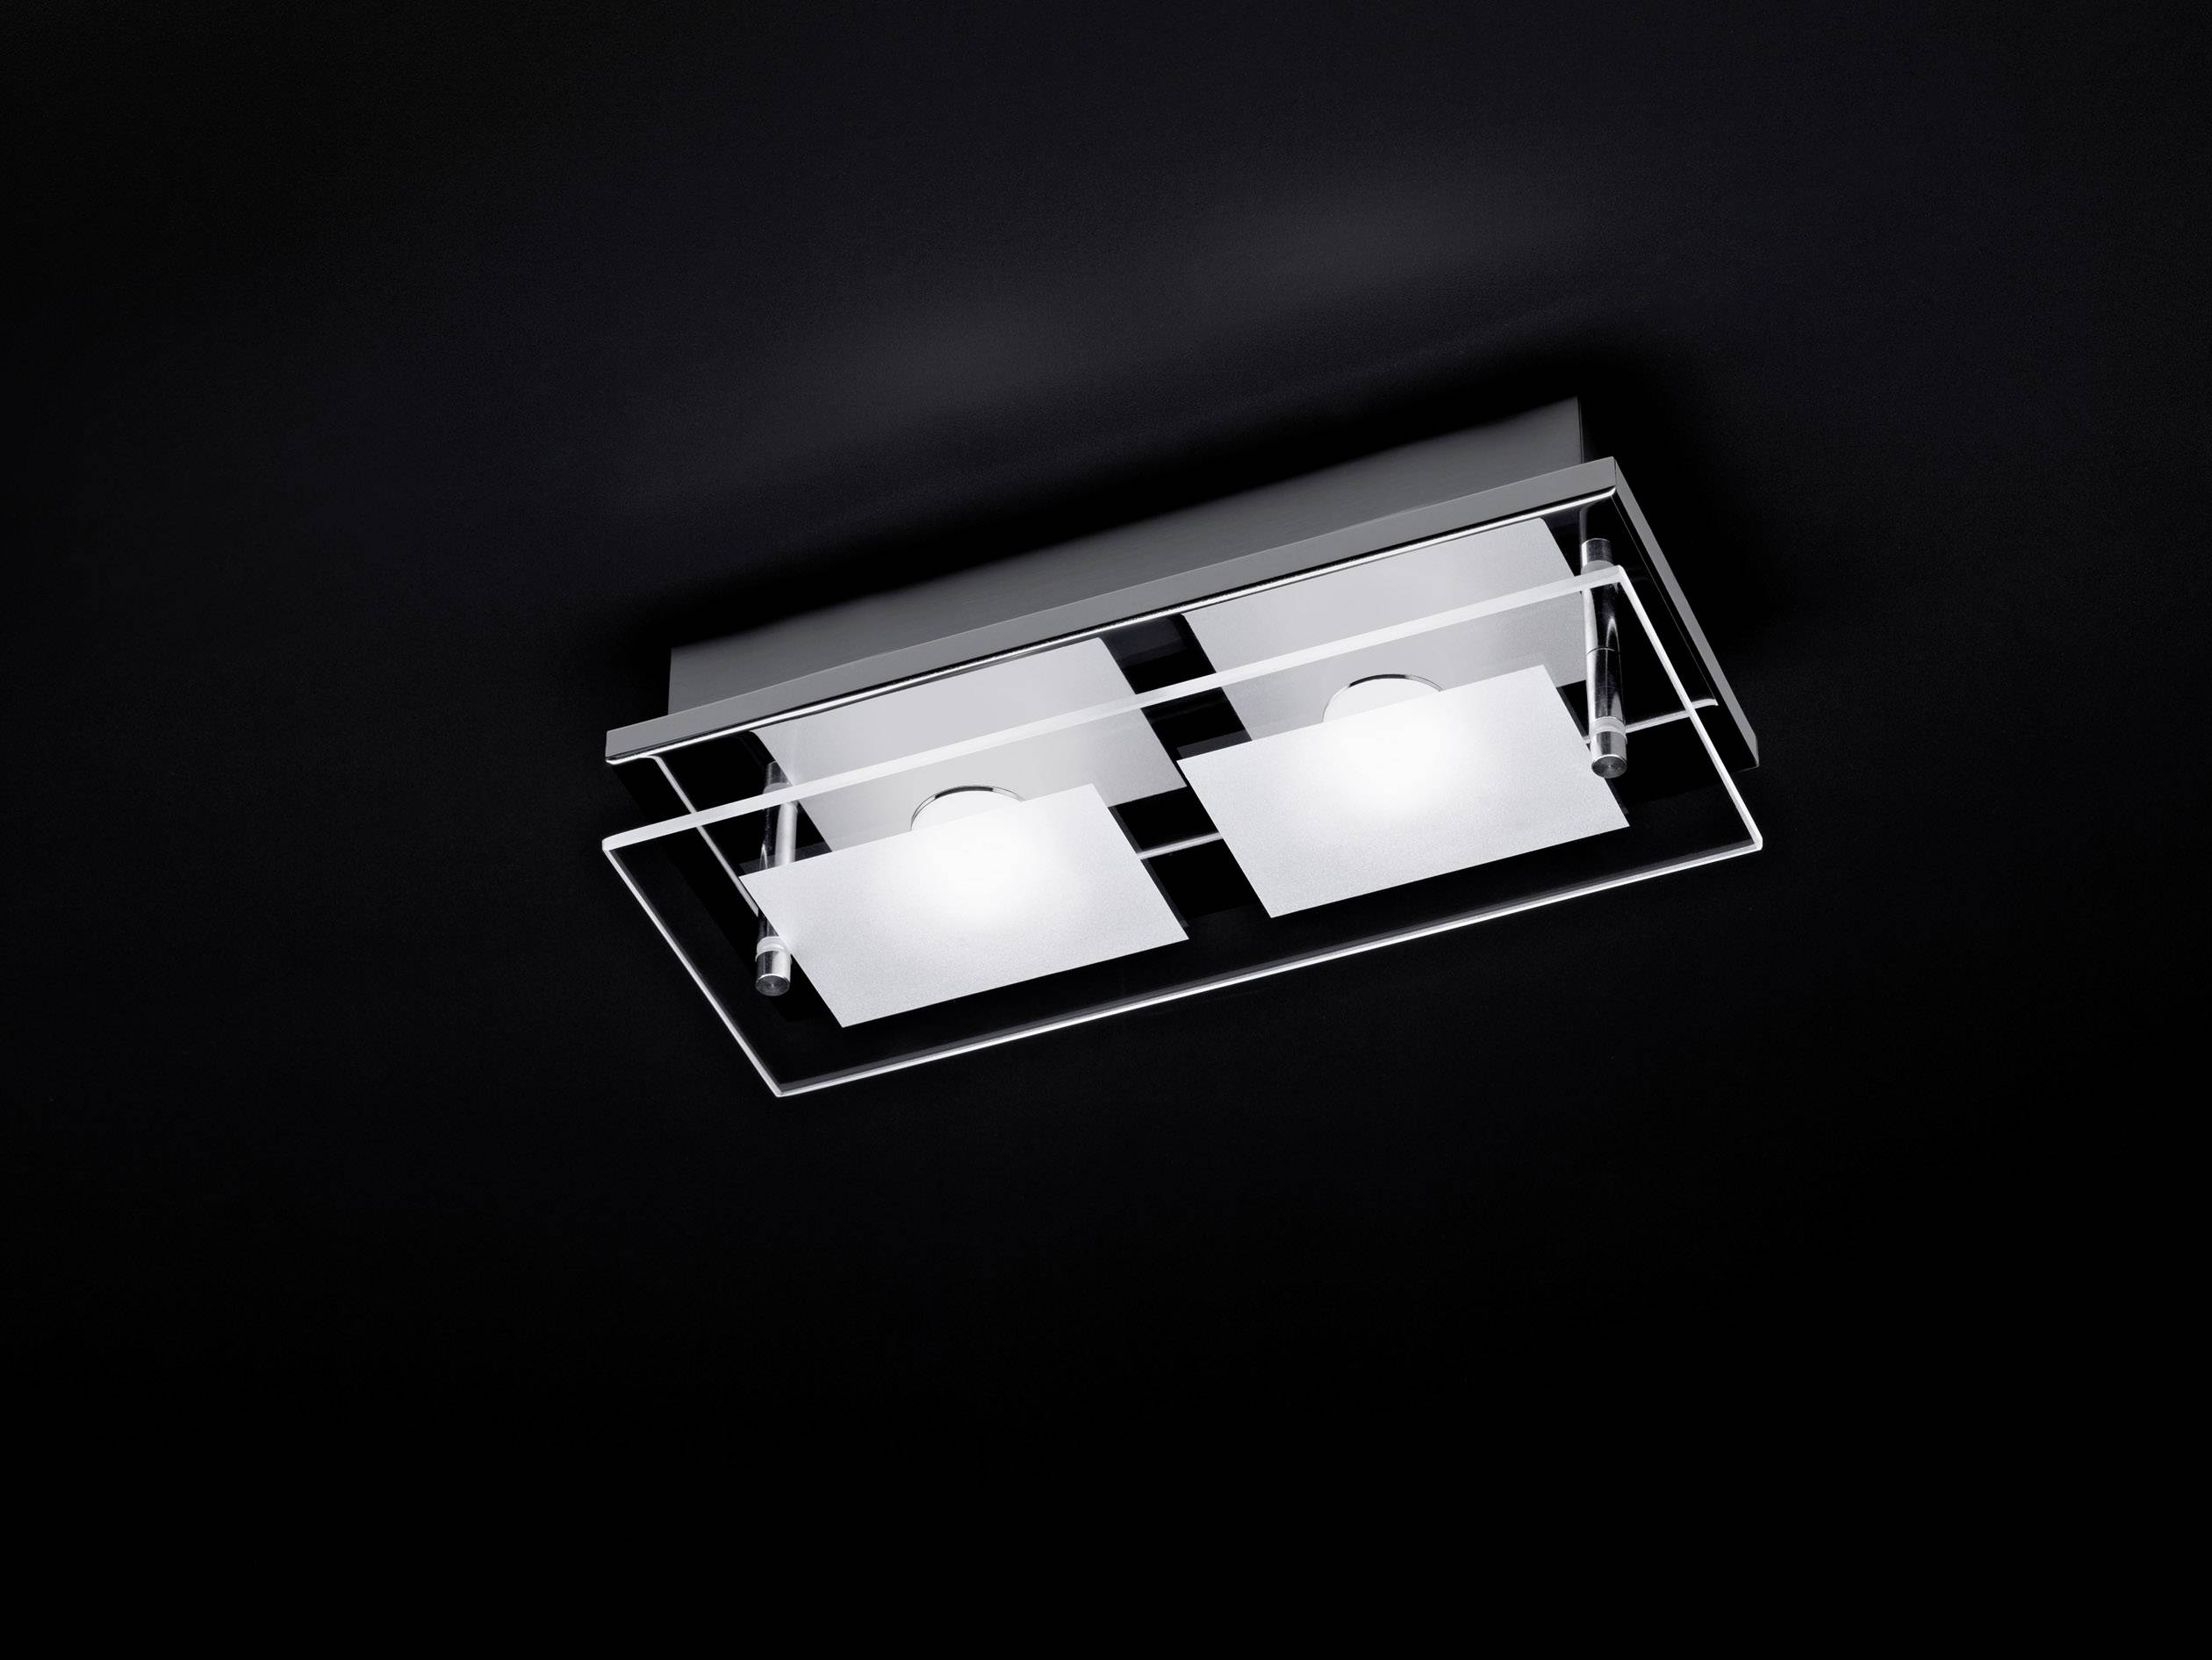 LED stropné svietidlo Paul Neuhaus Chiron 6034-17, 6.6 W, teplá biela, chróm